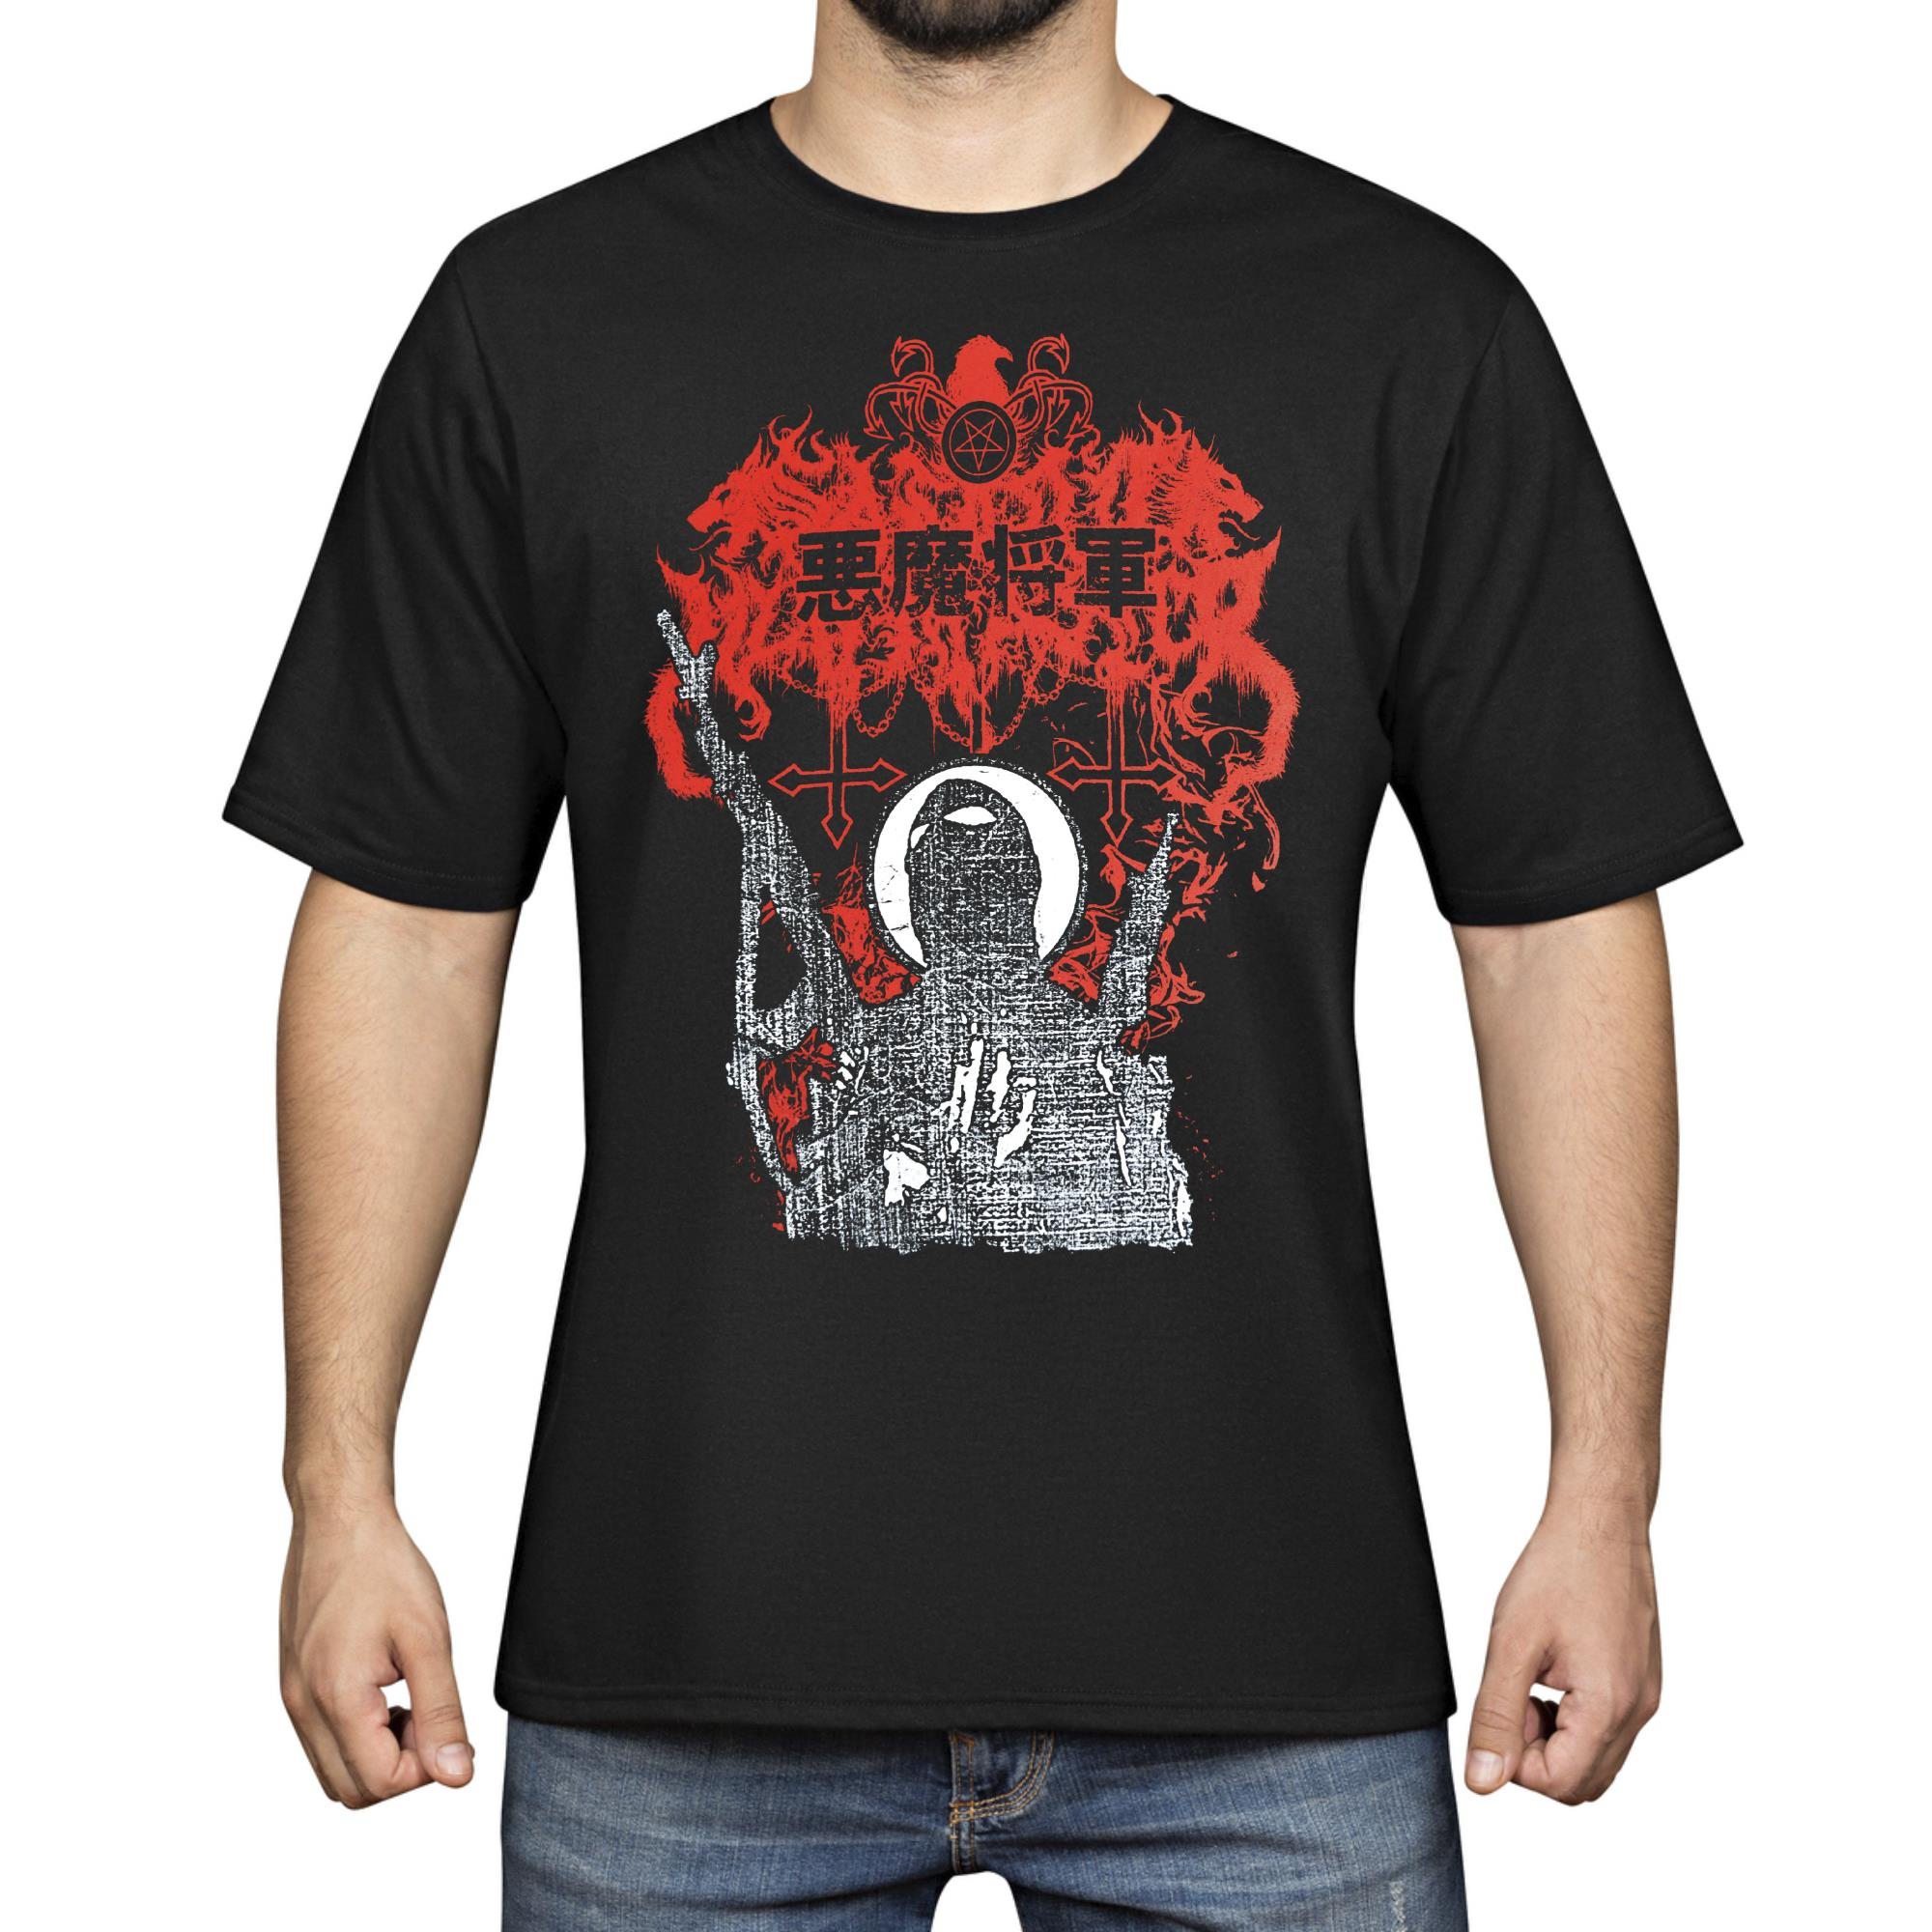 Black Metal Commando